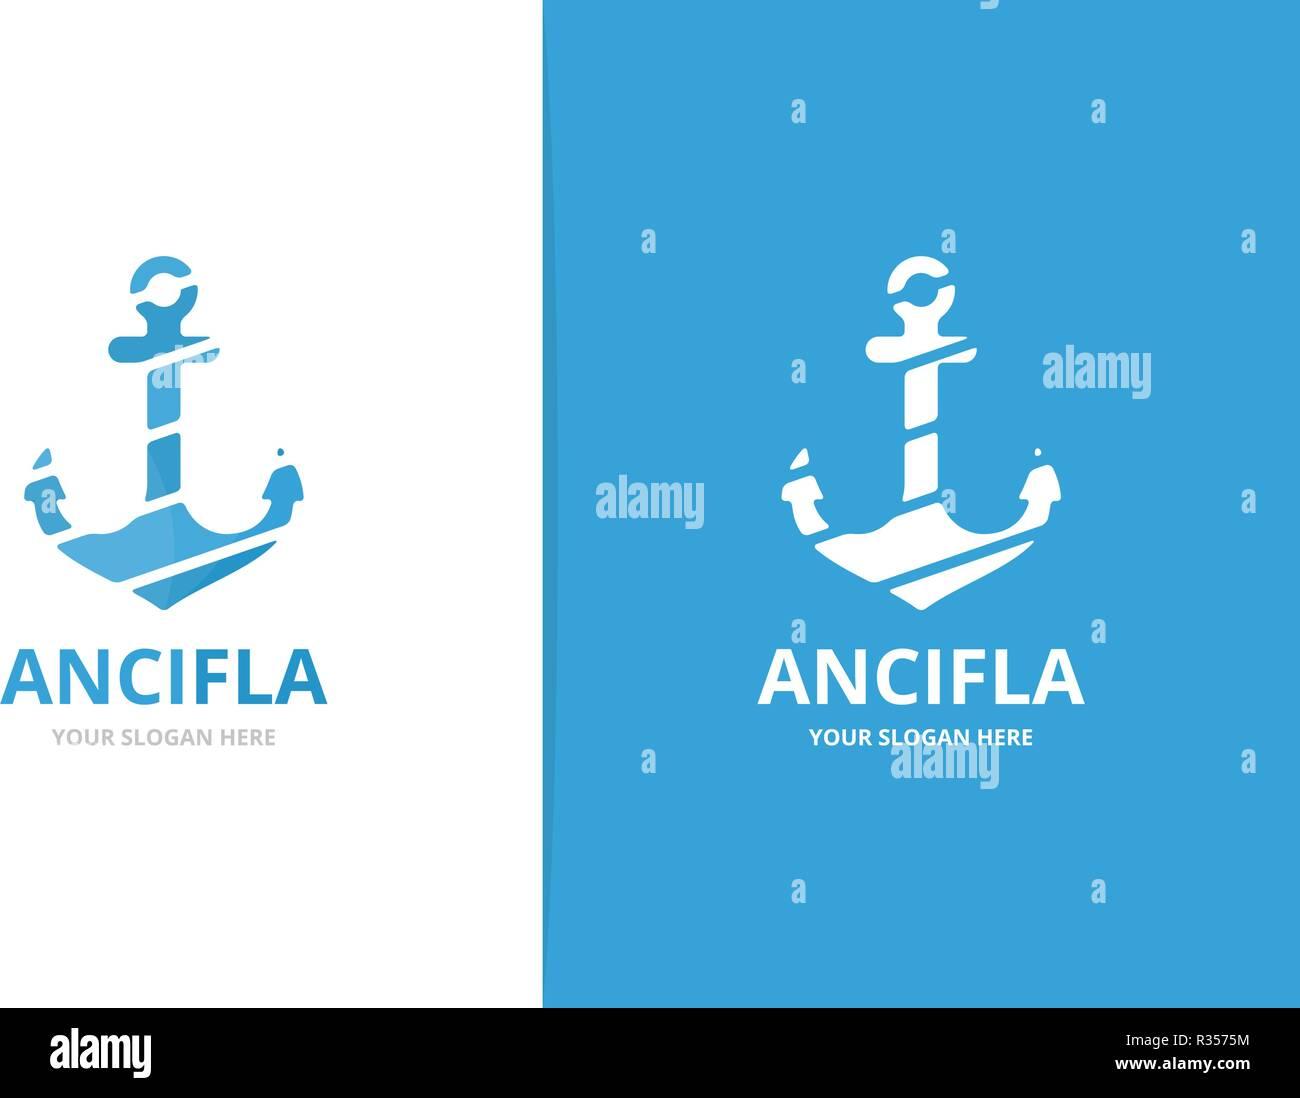 Vector anchor logo combination. Marine and nautical symbol or icon. Unique navy logotype design template. - Stock Image